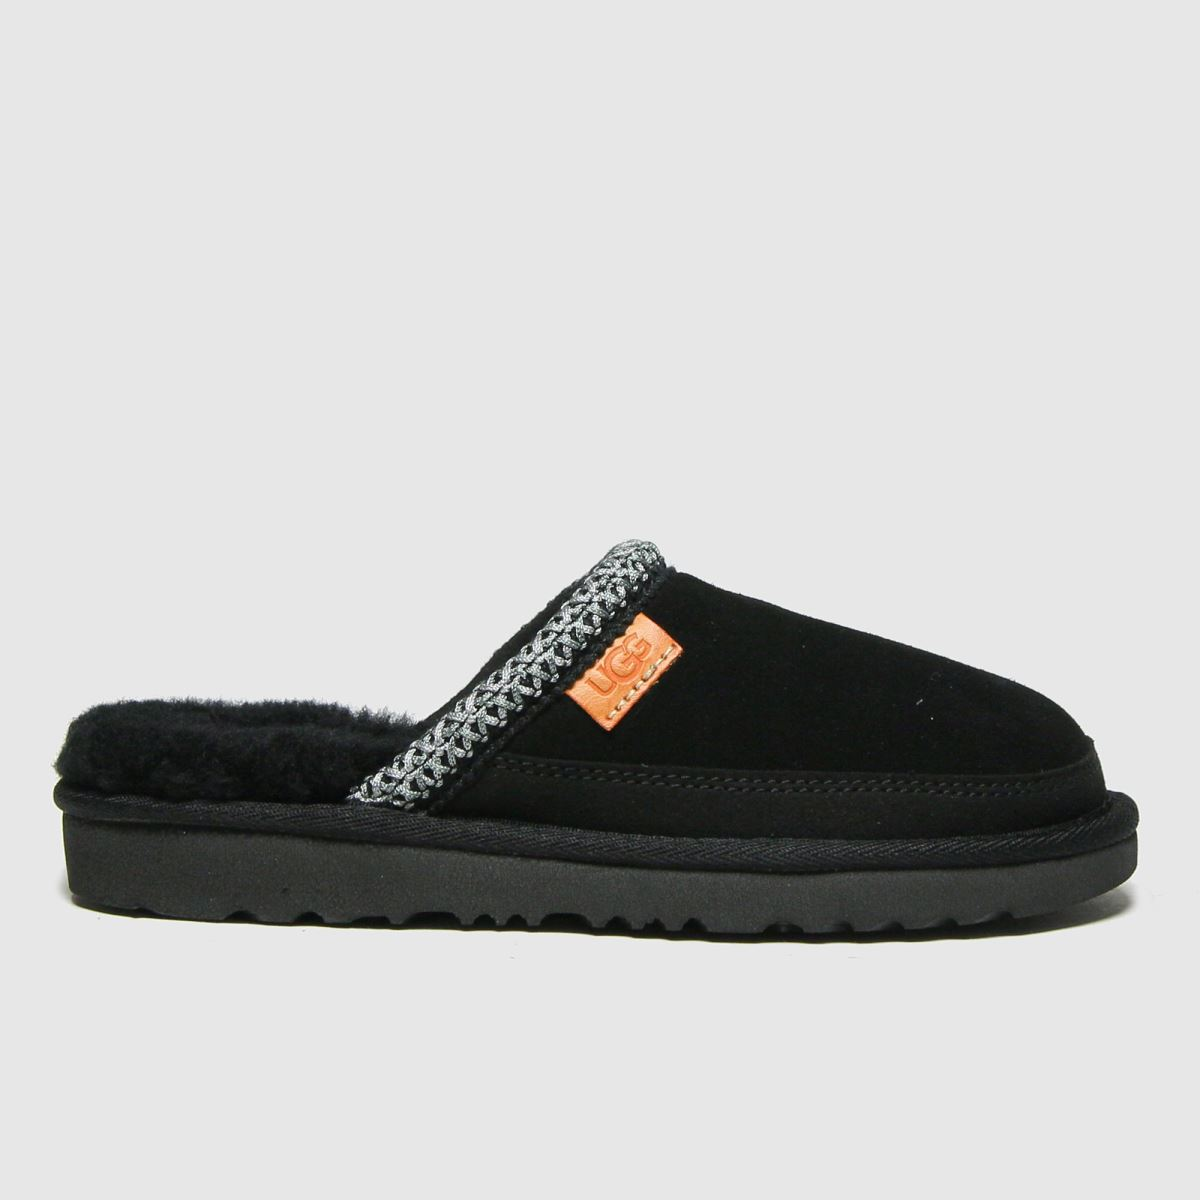 UGG Black Tasman Ii Slip-on Slippers Junior | UK 13